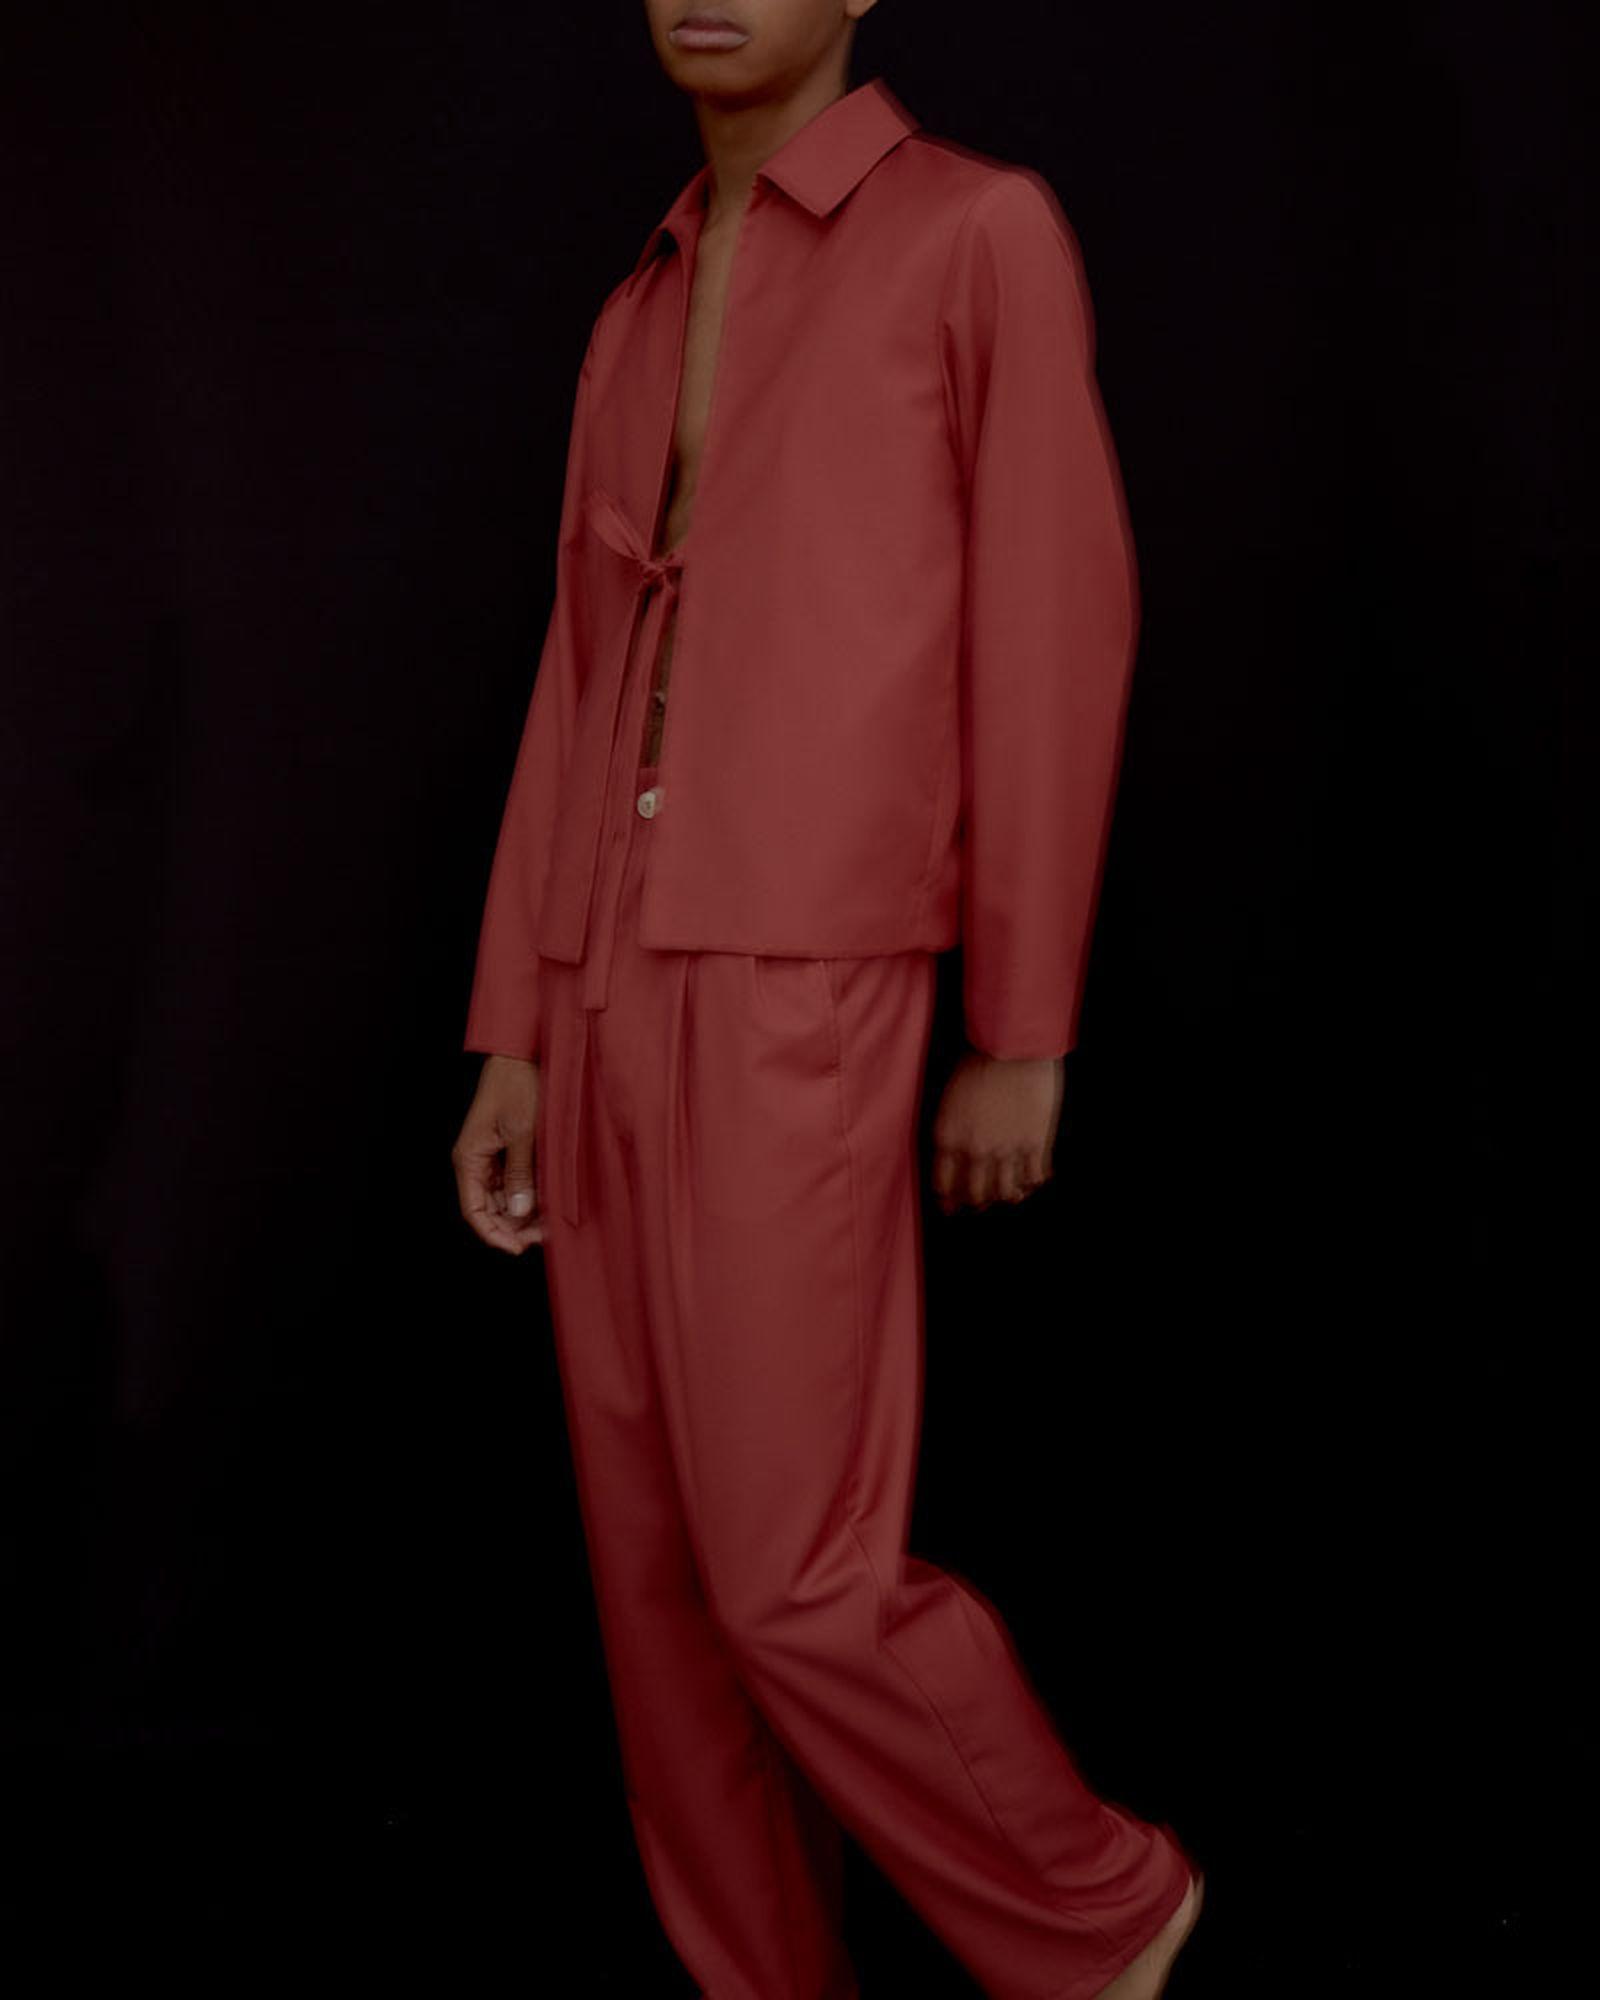 15one-dna-genderless-suiting-lookbook